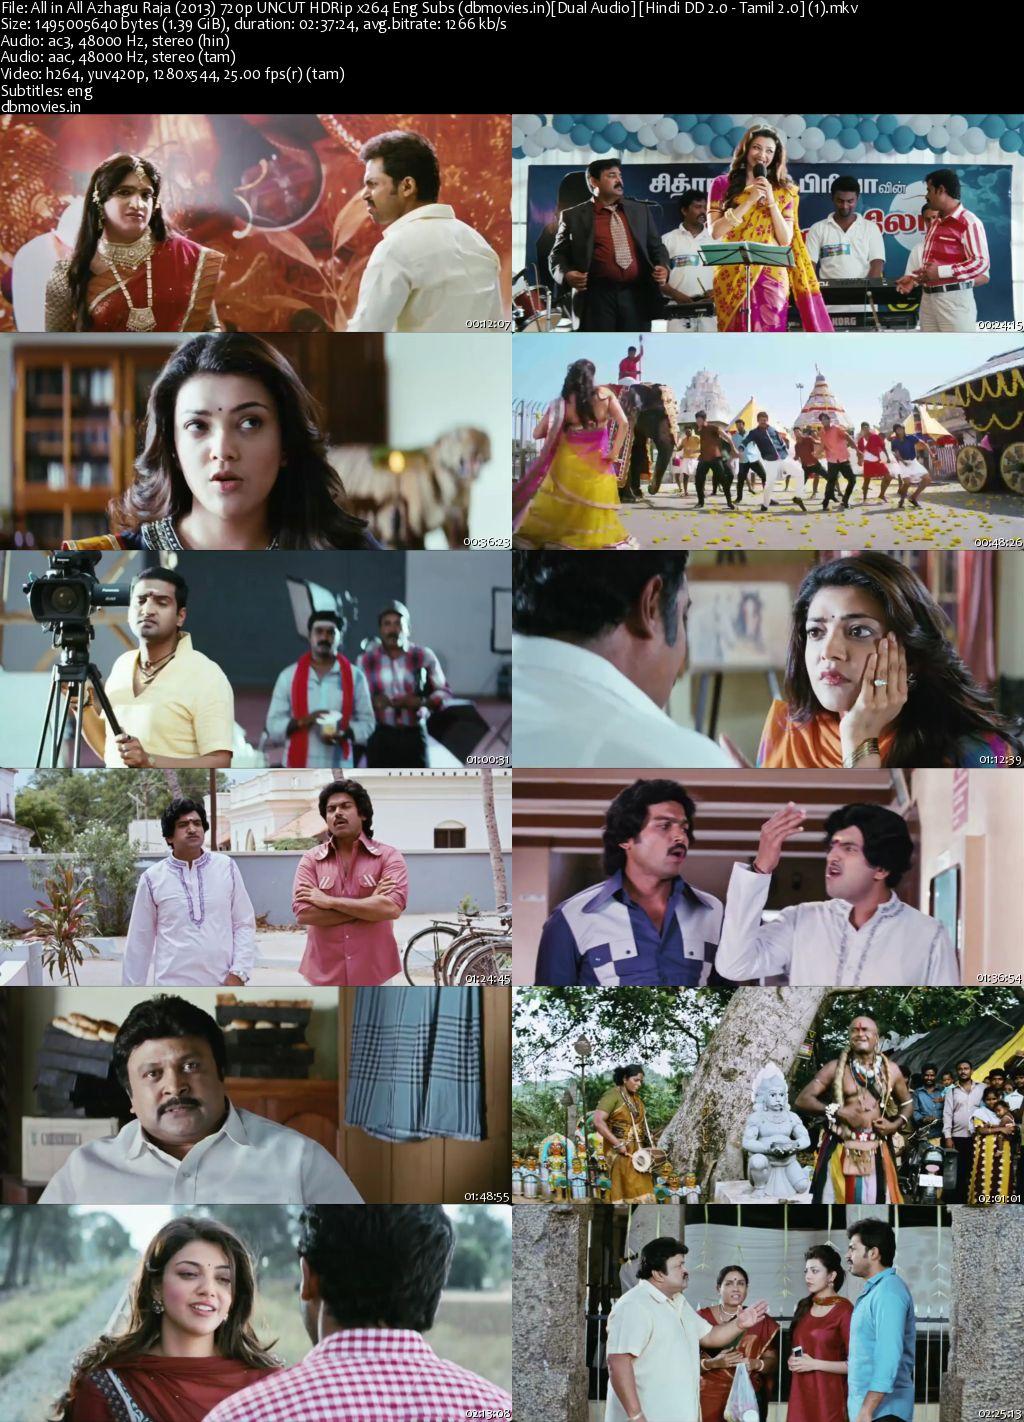 screen shot All in All Azhagu Raja 2013 Full Movie Dual Audio Hindi Download 720p